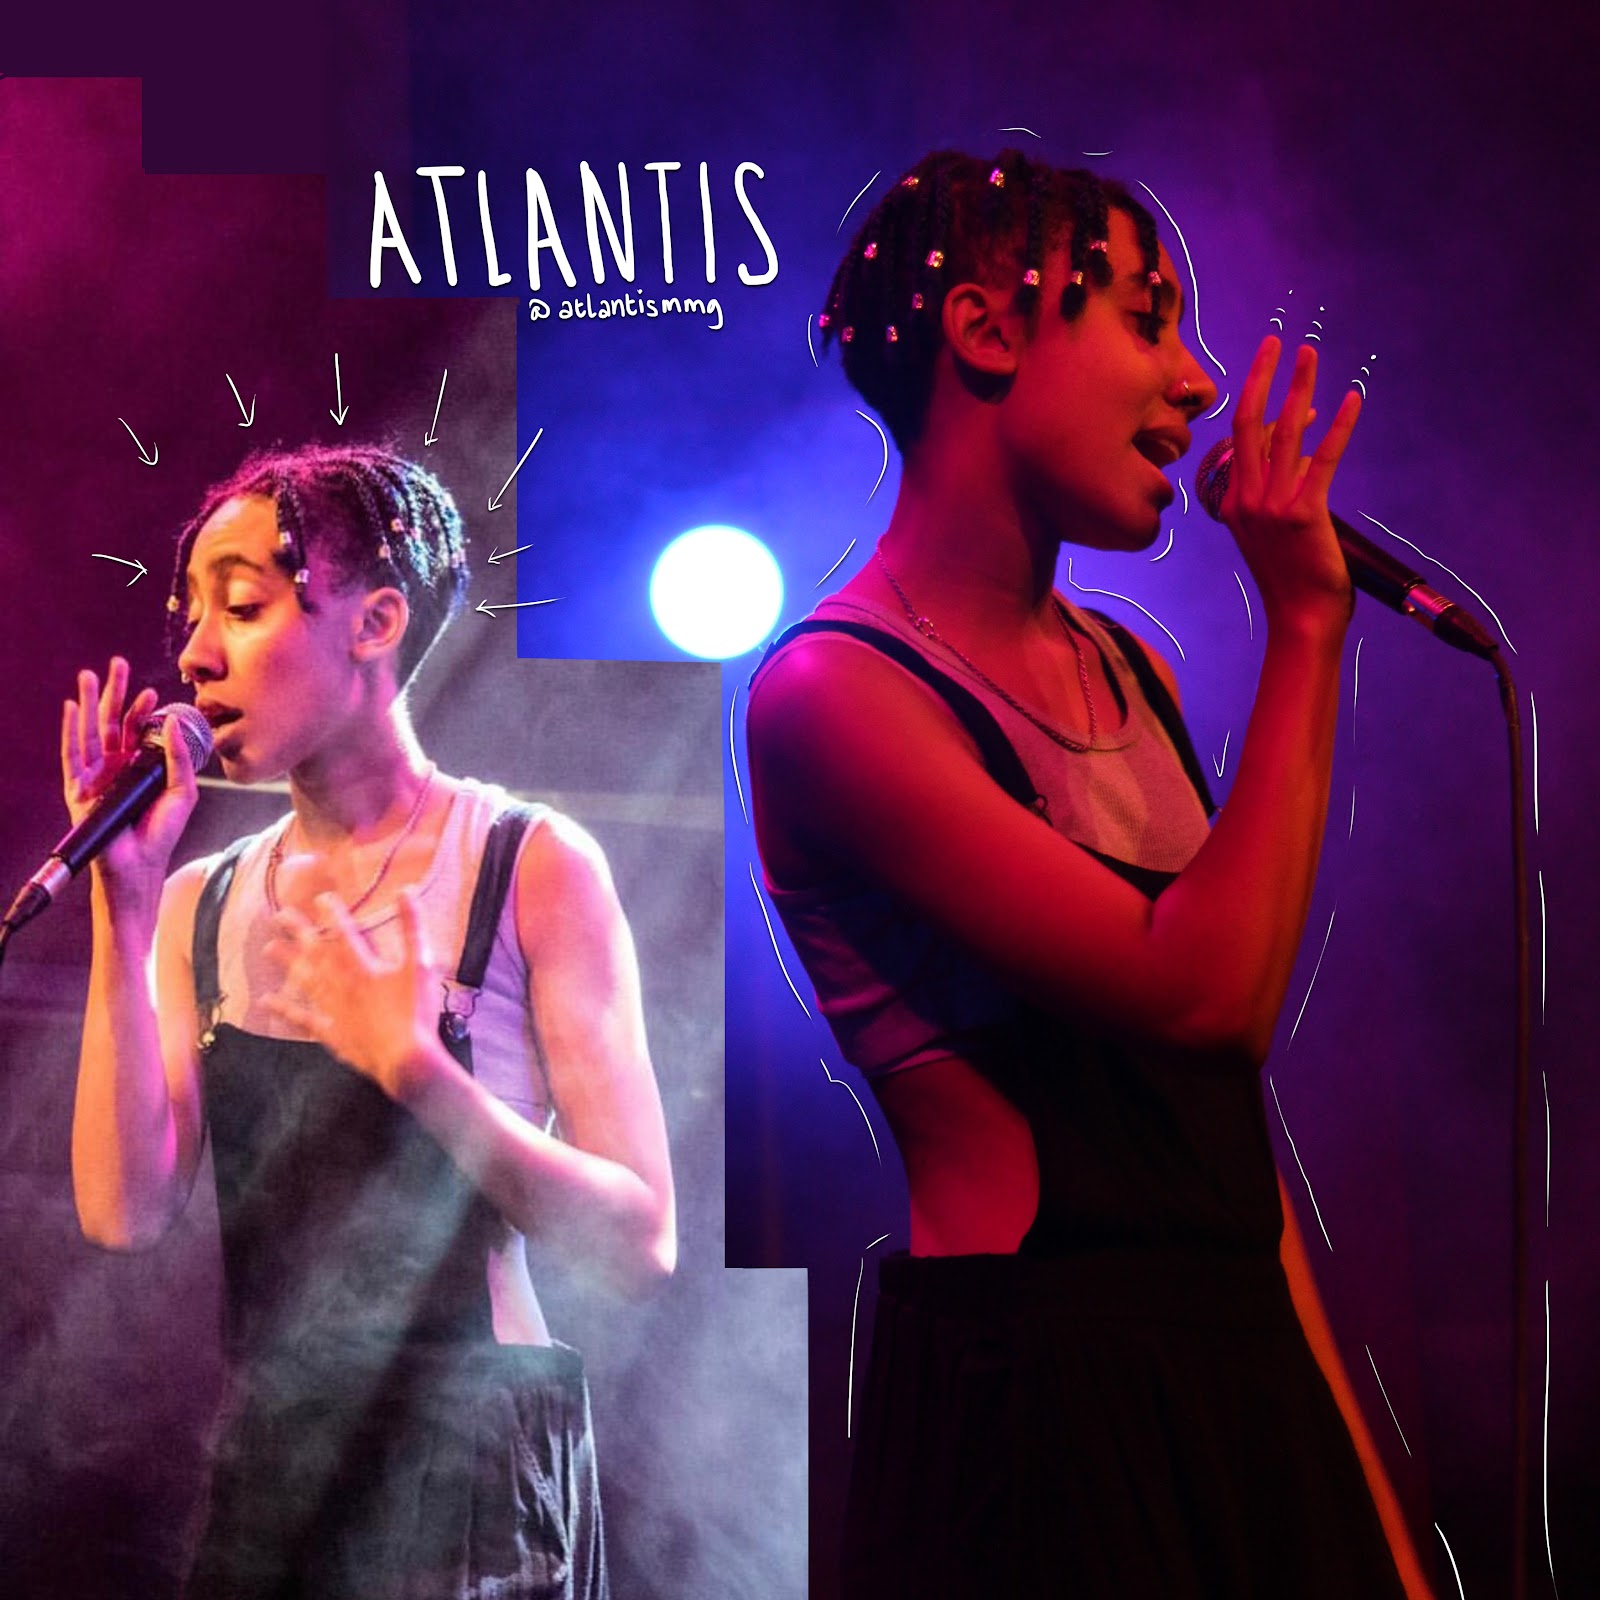 atlantis pic.jpg